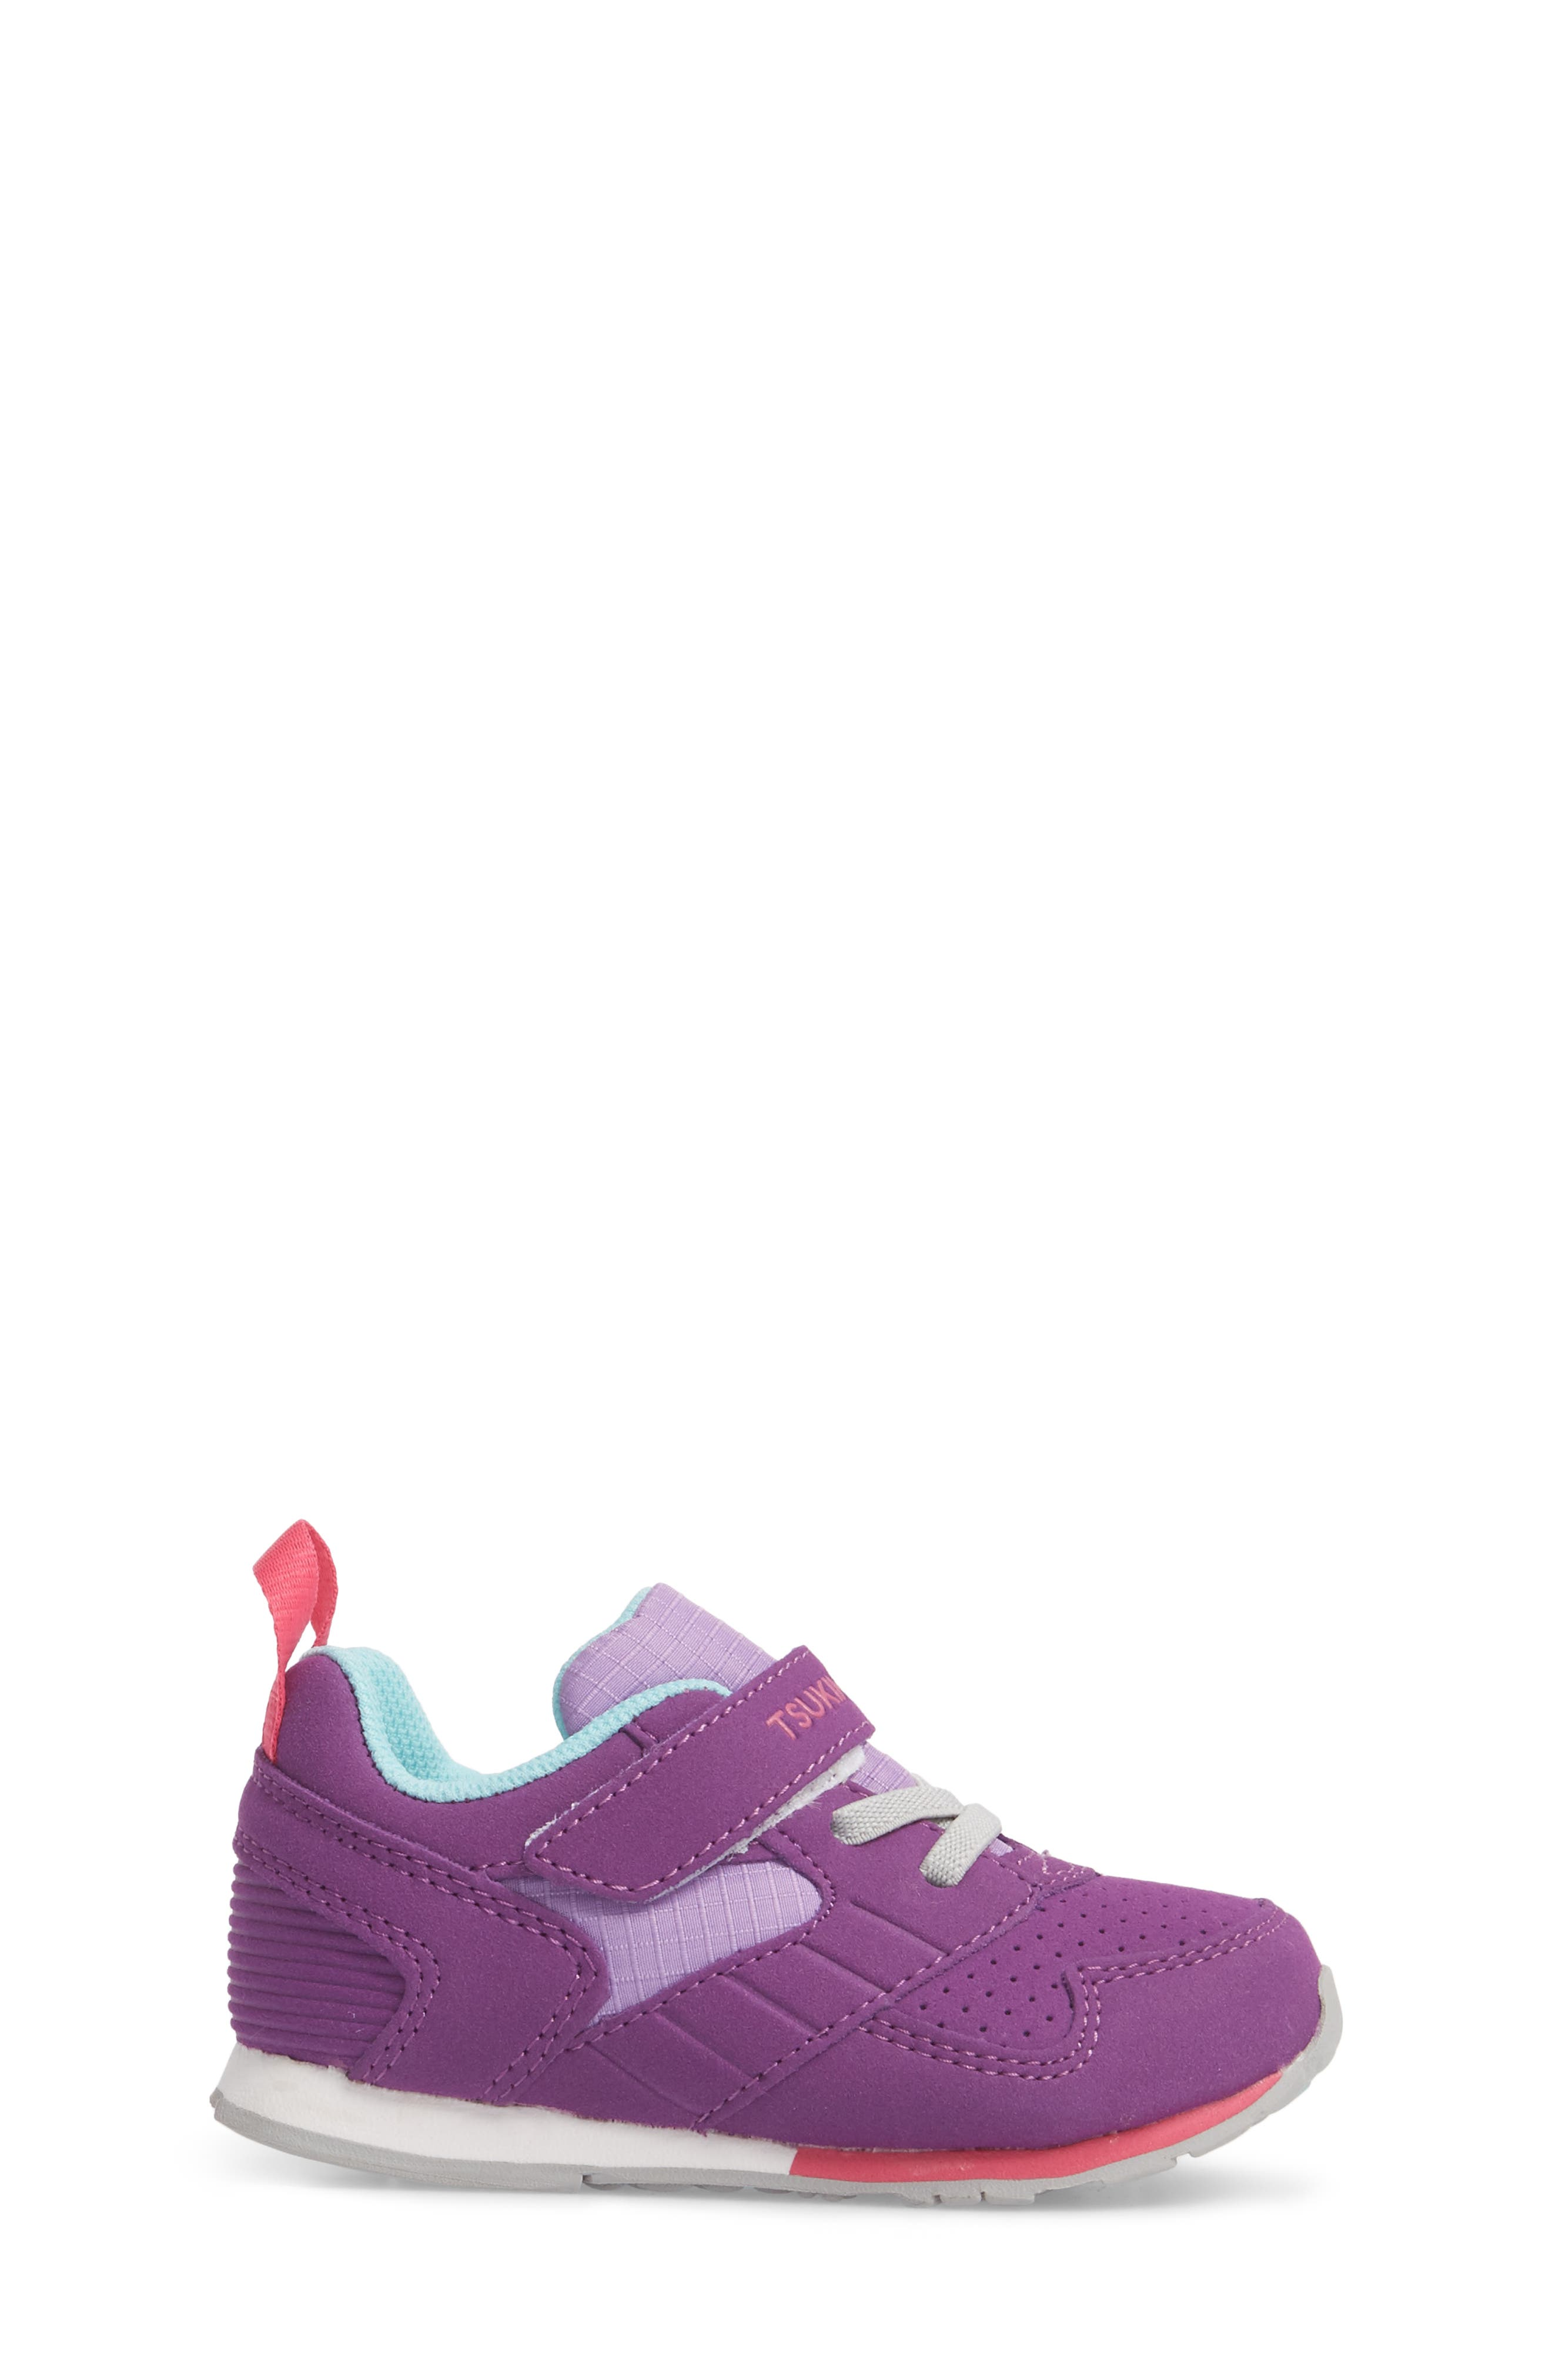 Alternate Image 3  - Tsukihoshi Racer Washable Sneaker (Walker, Toddler & Little Kid)